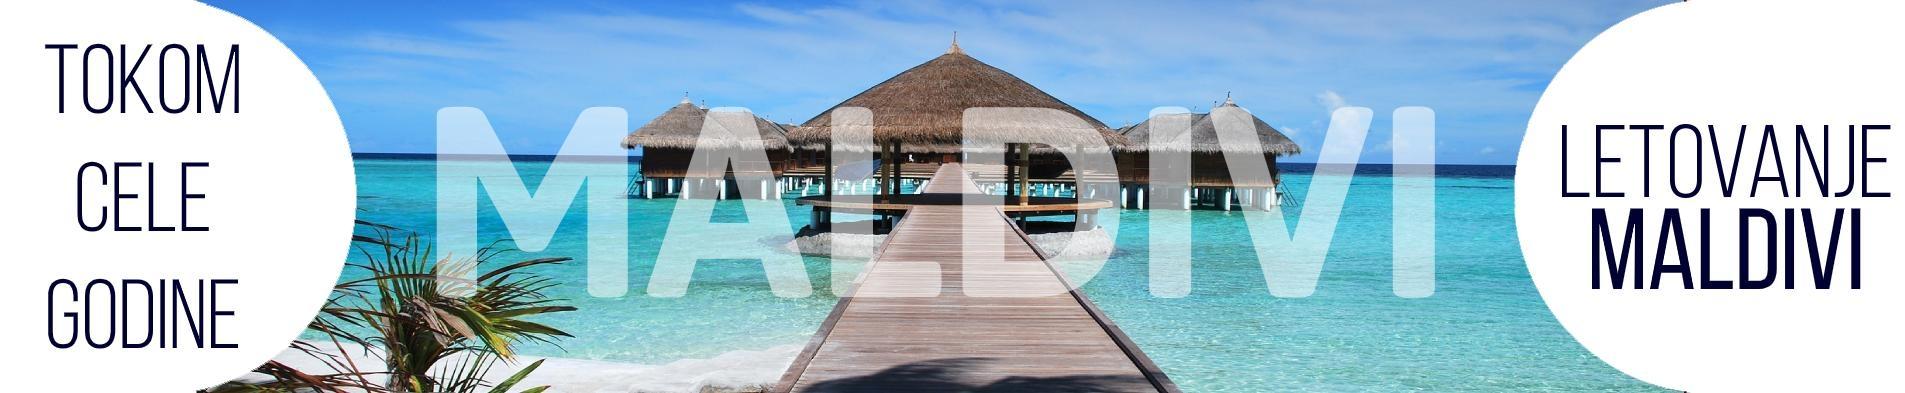 MALDIVI LETOVANJE